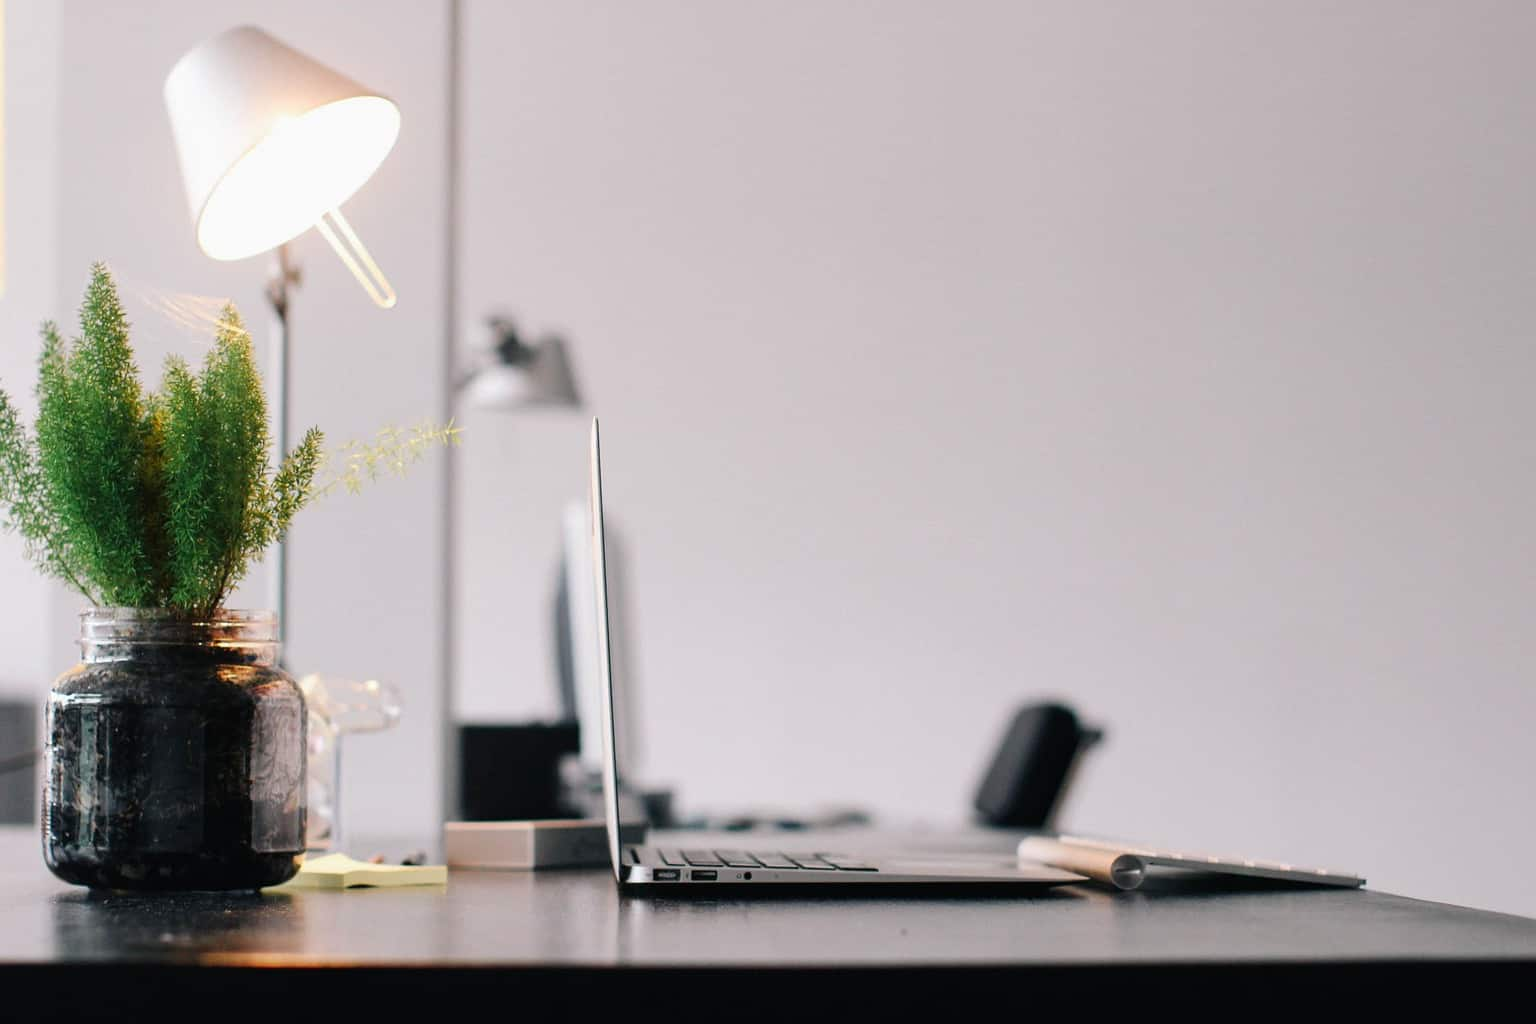 How To Maintain Office Indoor Plants In Winter